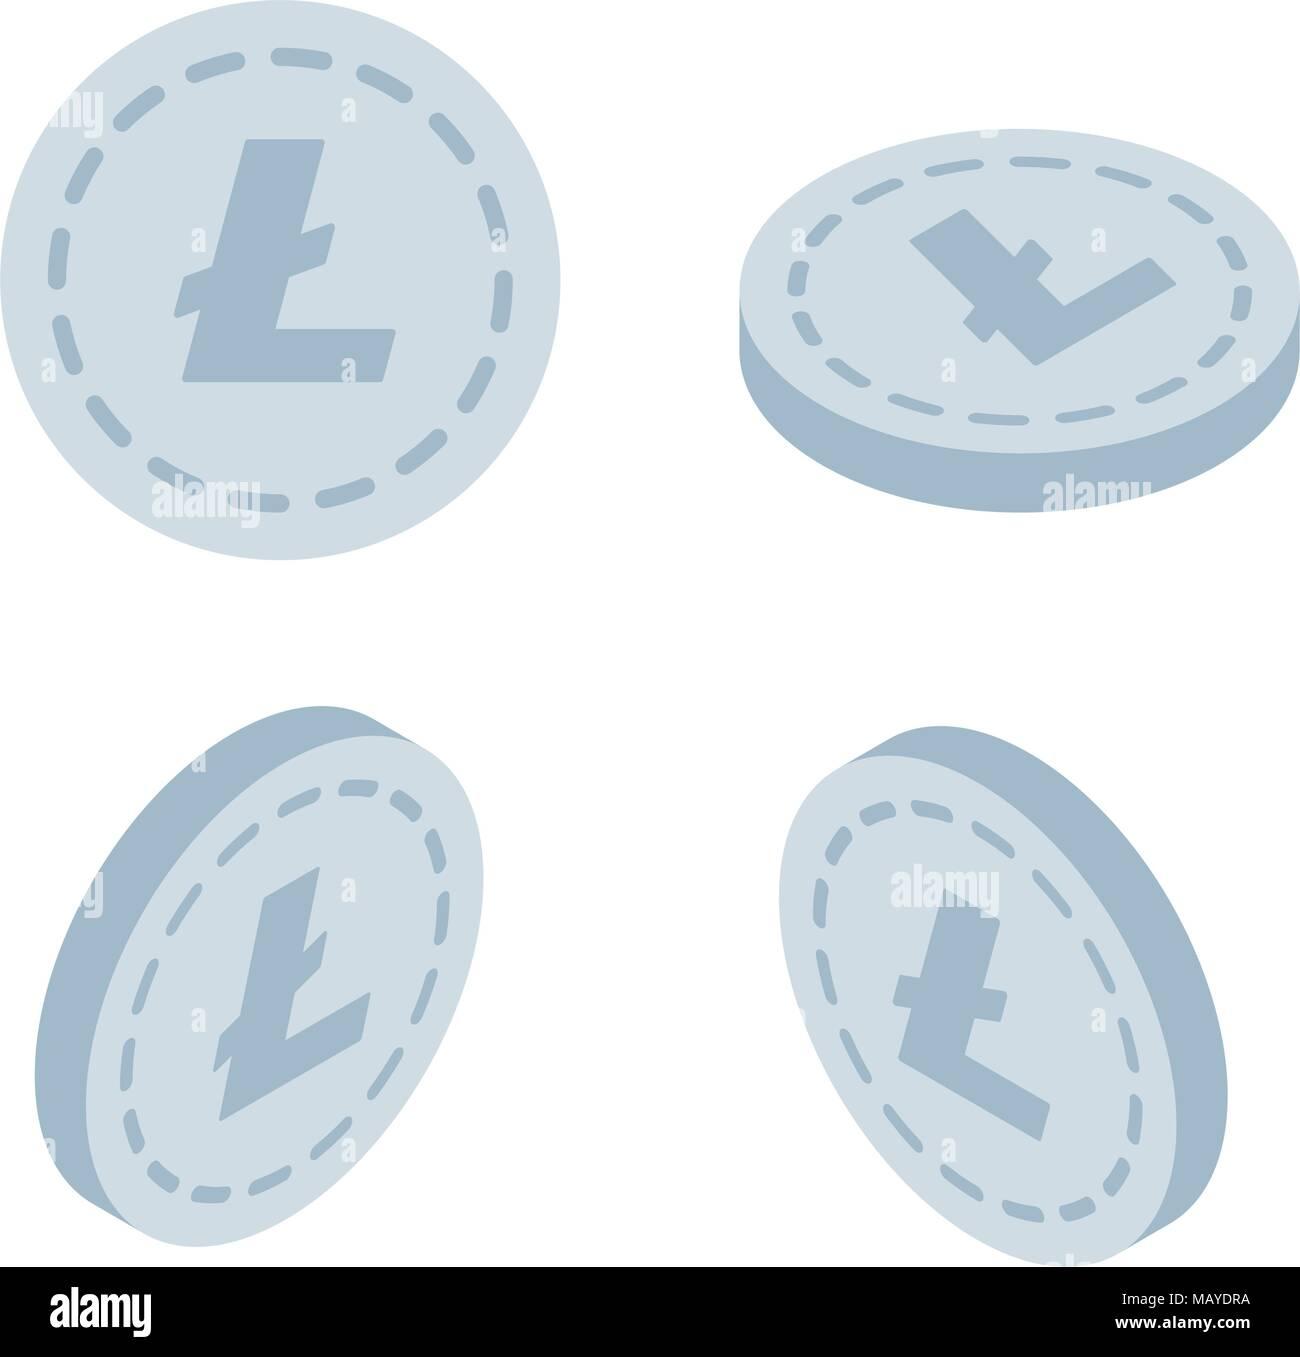 Litecoin Coin Gold Coin Vector  Coin payments on blockchain